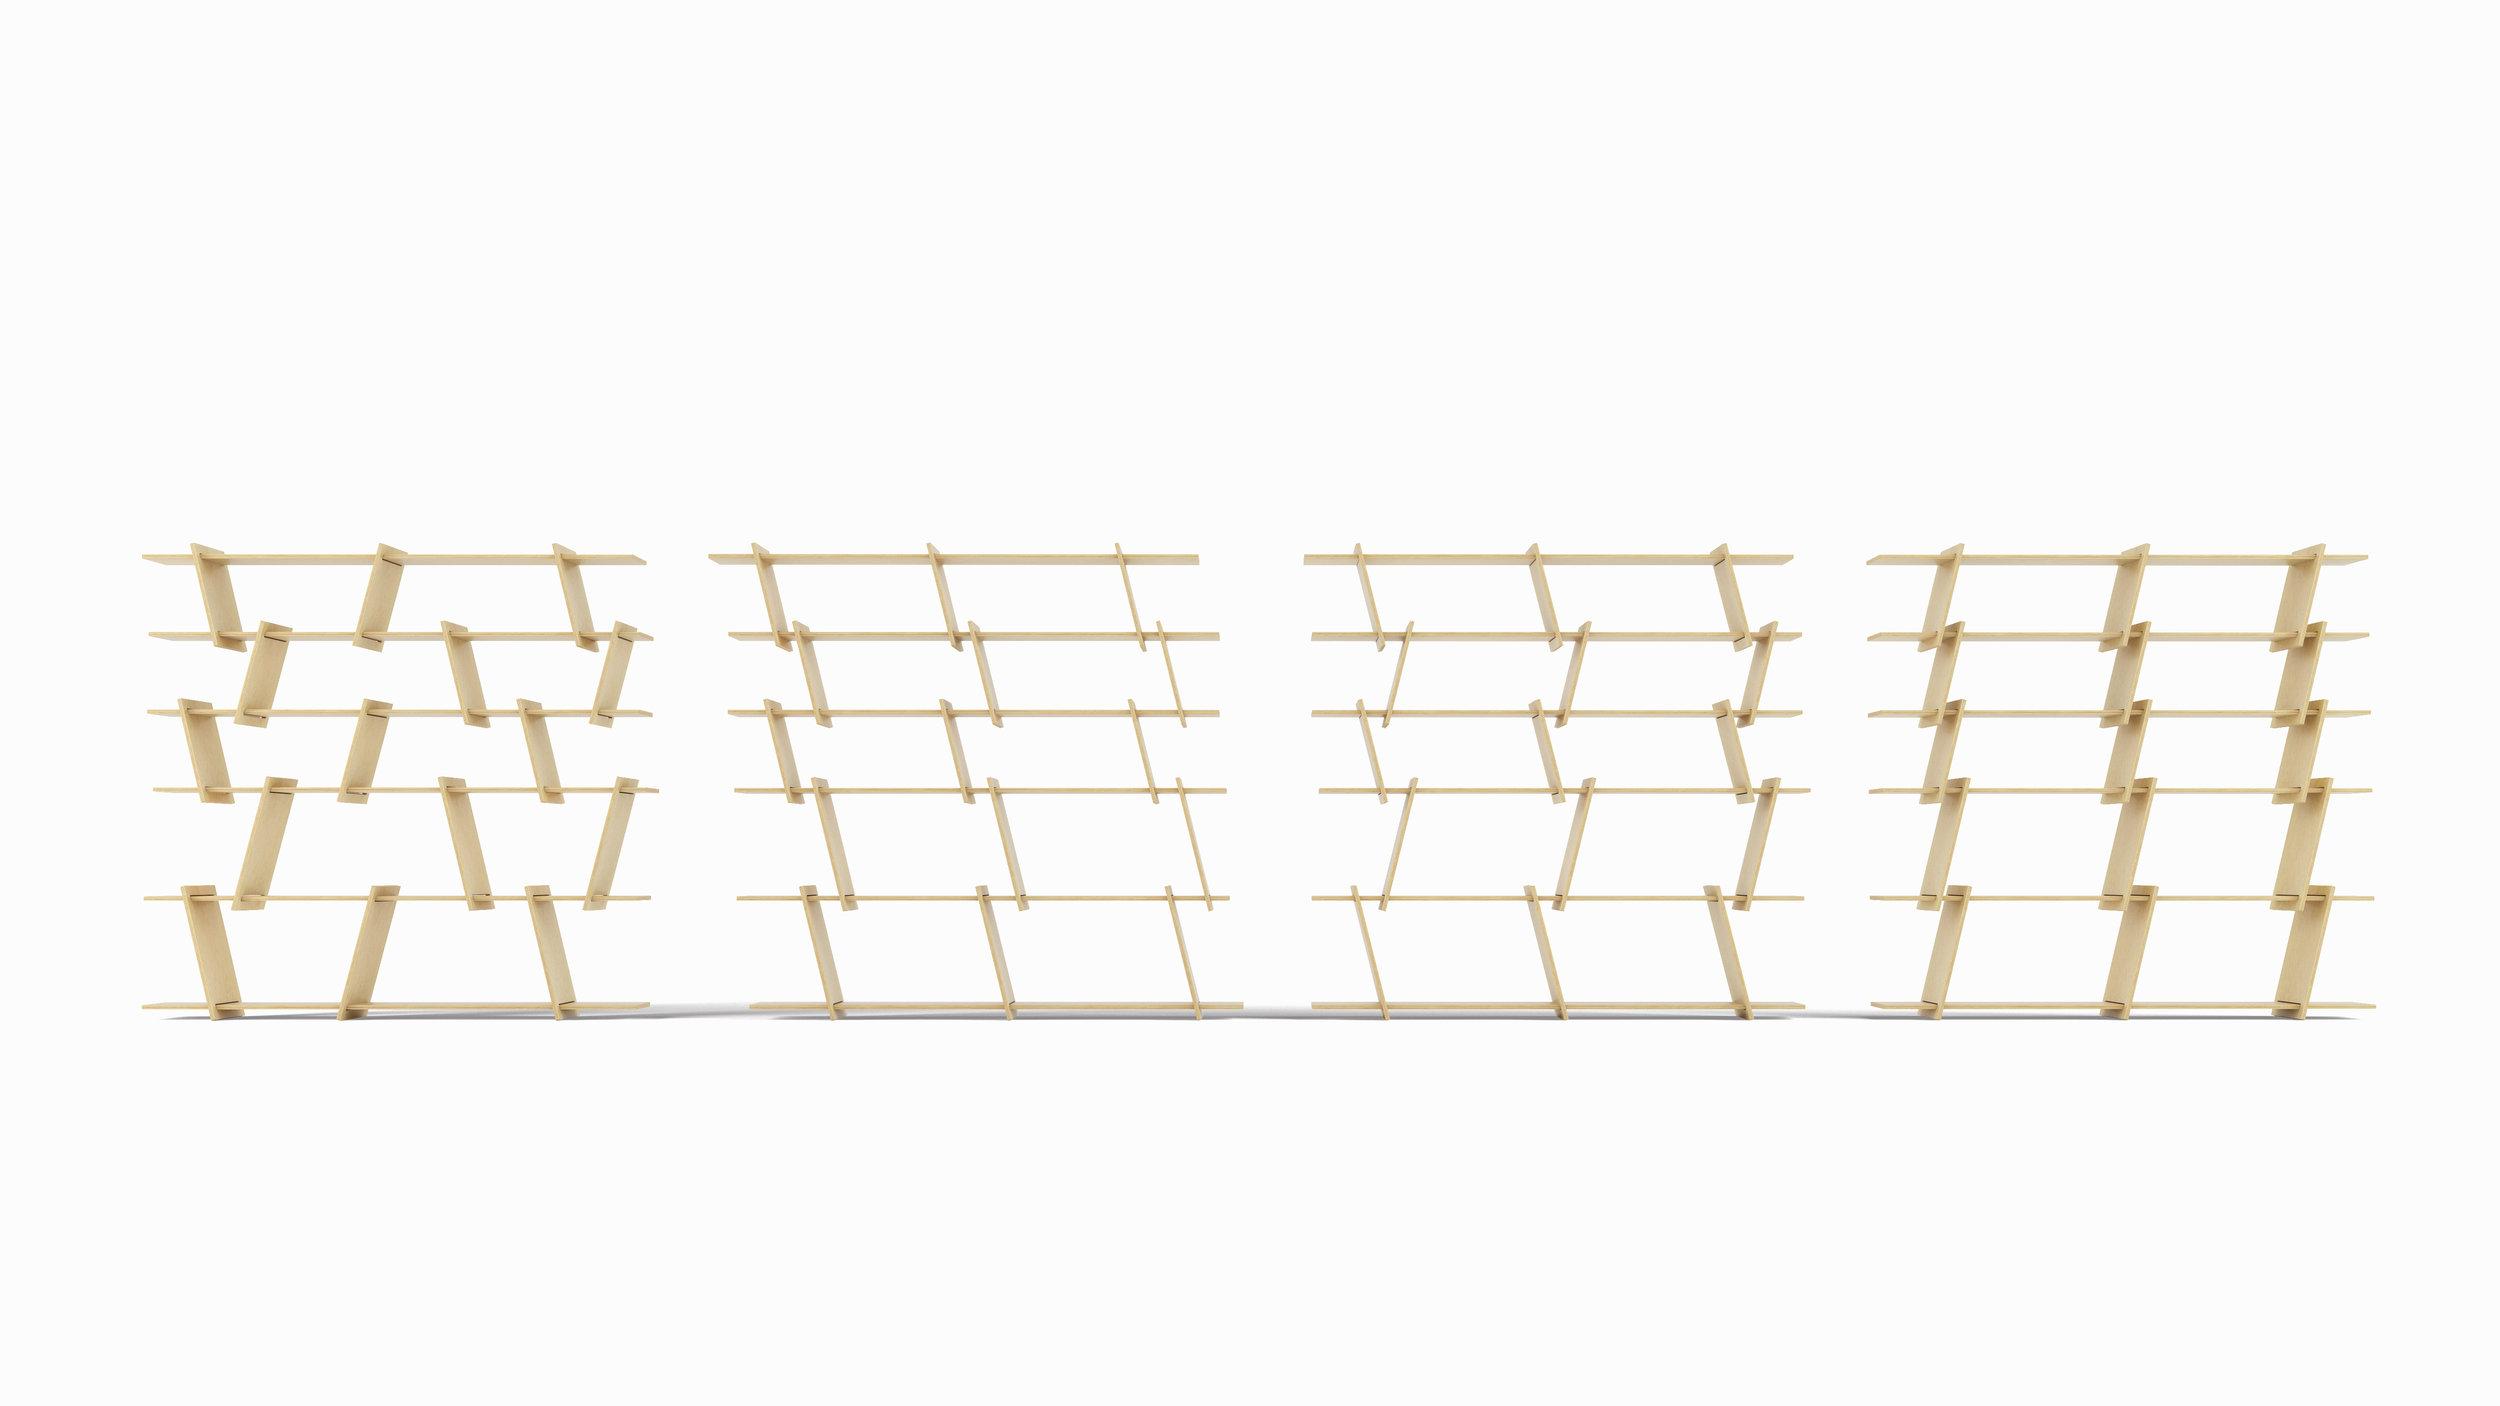 FIT_Furniture-Italic_shelf_options-Ronen_Kadushin